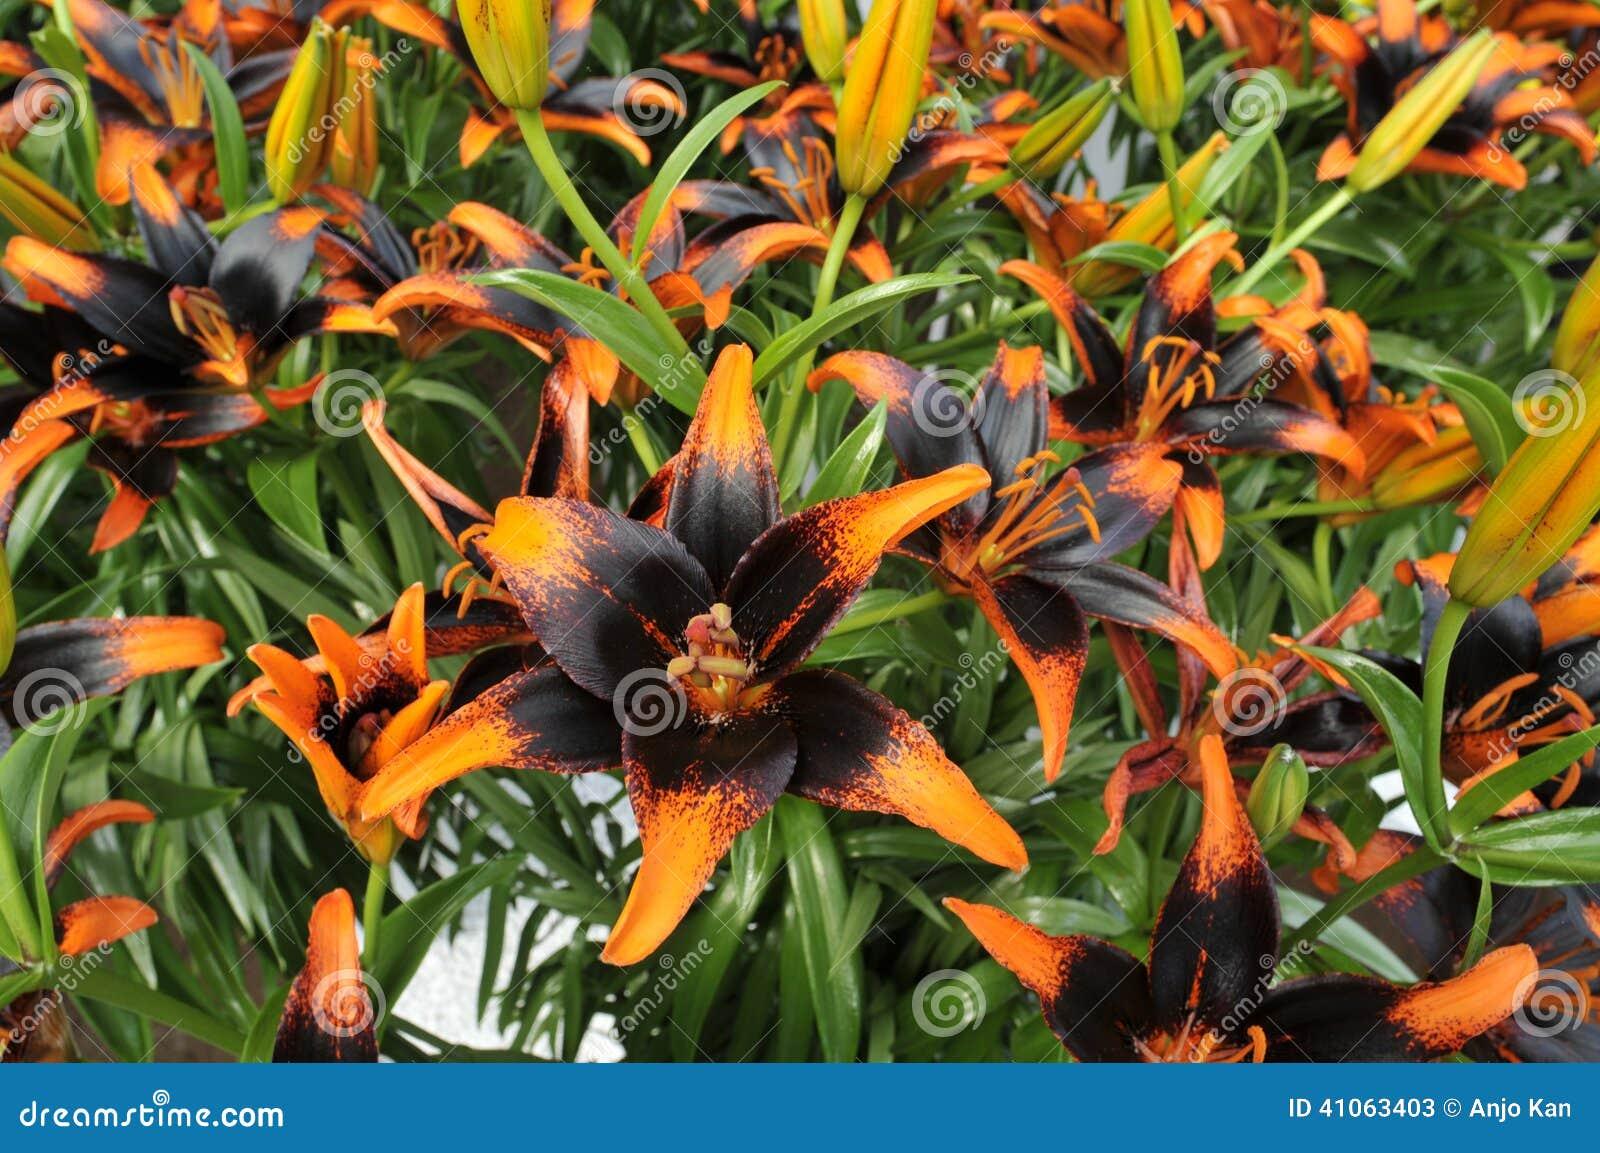 Black and orange lilies stock image image of field beautiful black and orange lilies izmirmasajfo